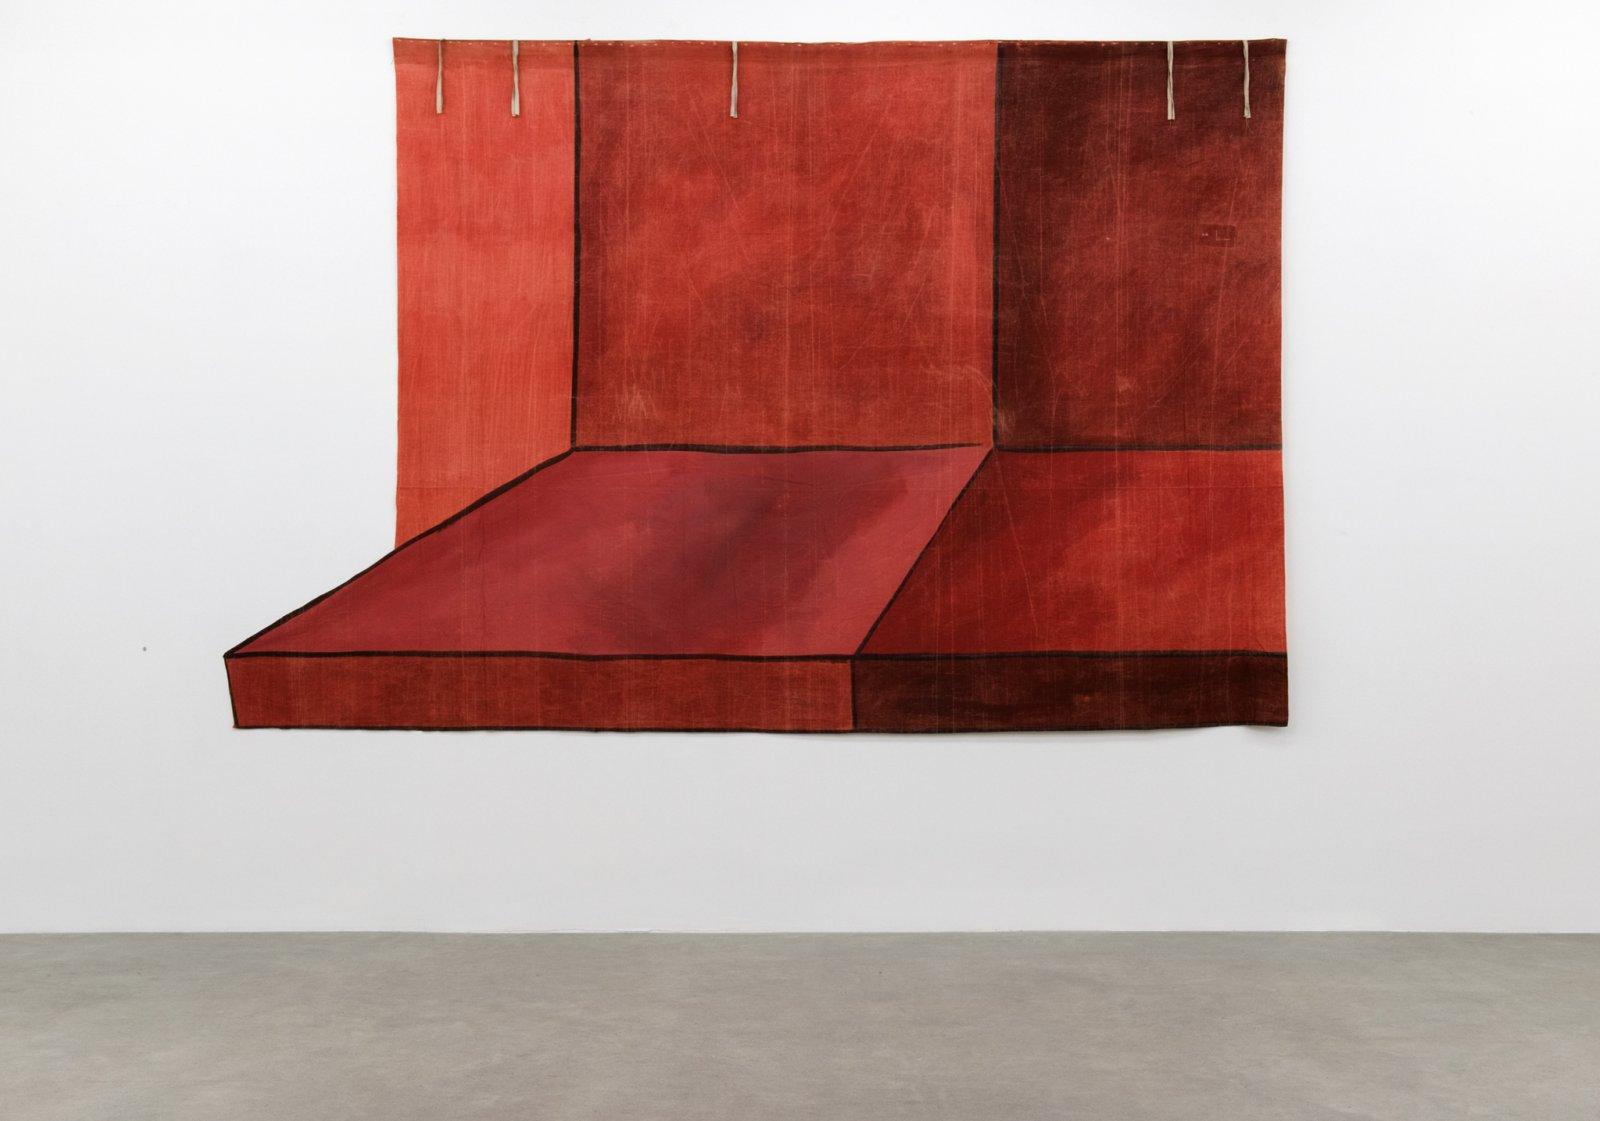 Geoffrey Farmer, THEMSELVES, ITSELF SHELFSELF, 2017, theatre backdrop (1939), 119 x 180 in. (302 x 458 cm)